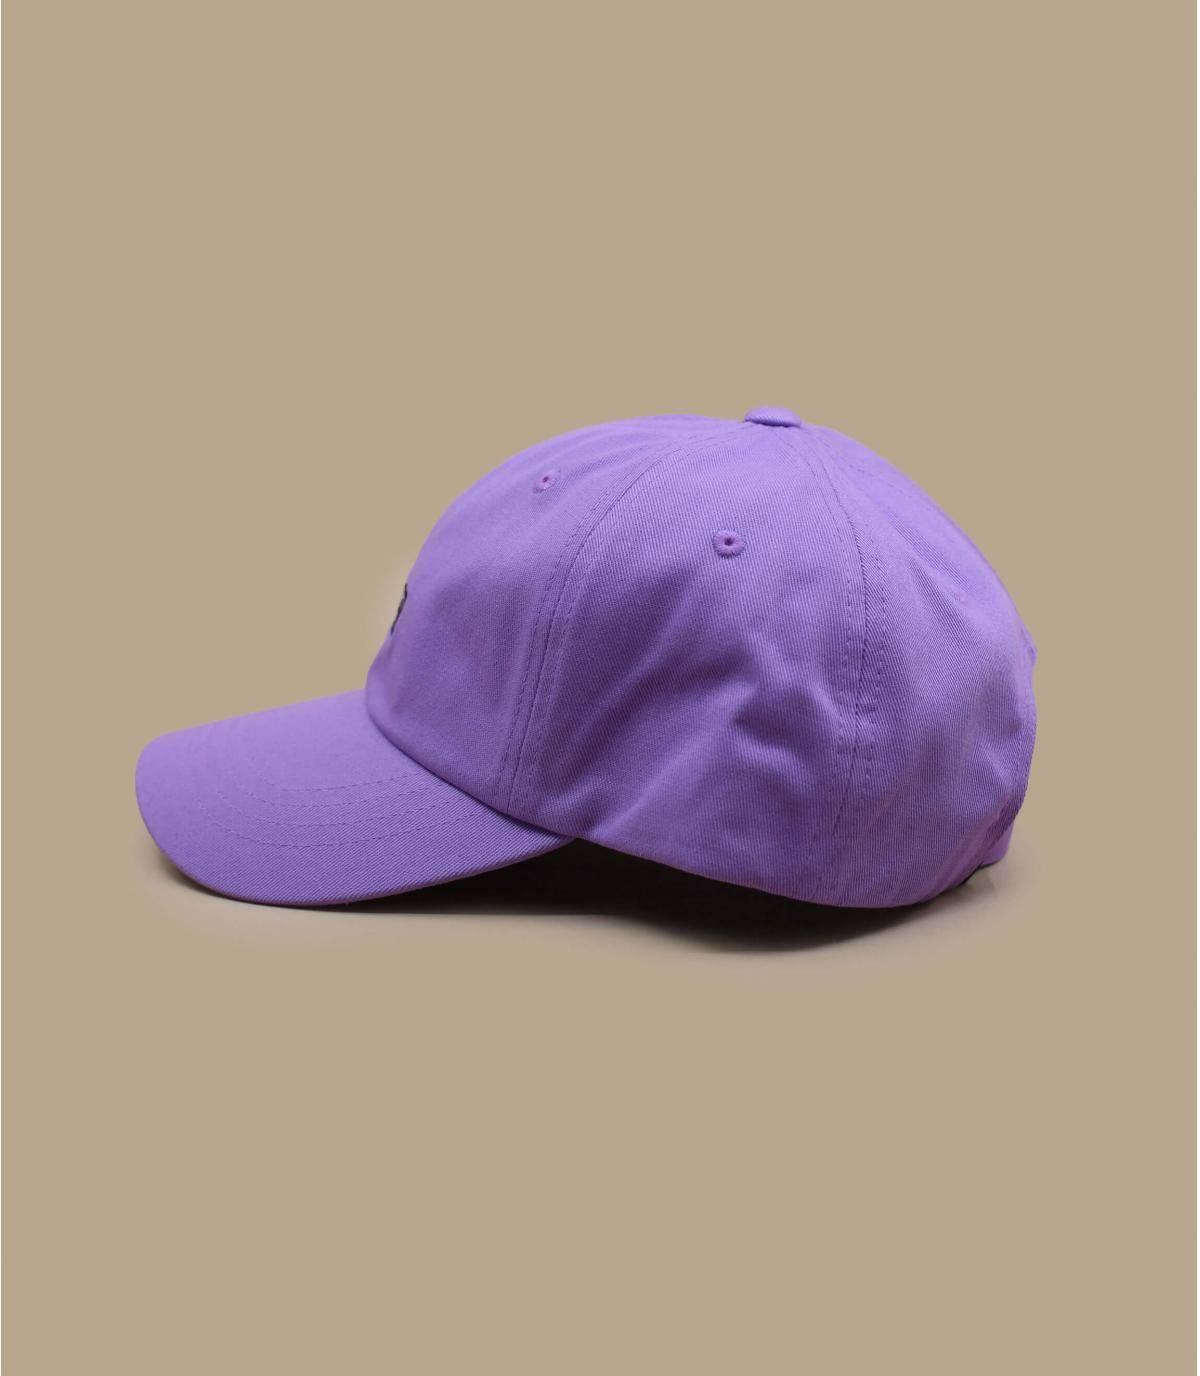 Détails Dad Hat wmn Drop V II english lavendar - image 3